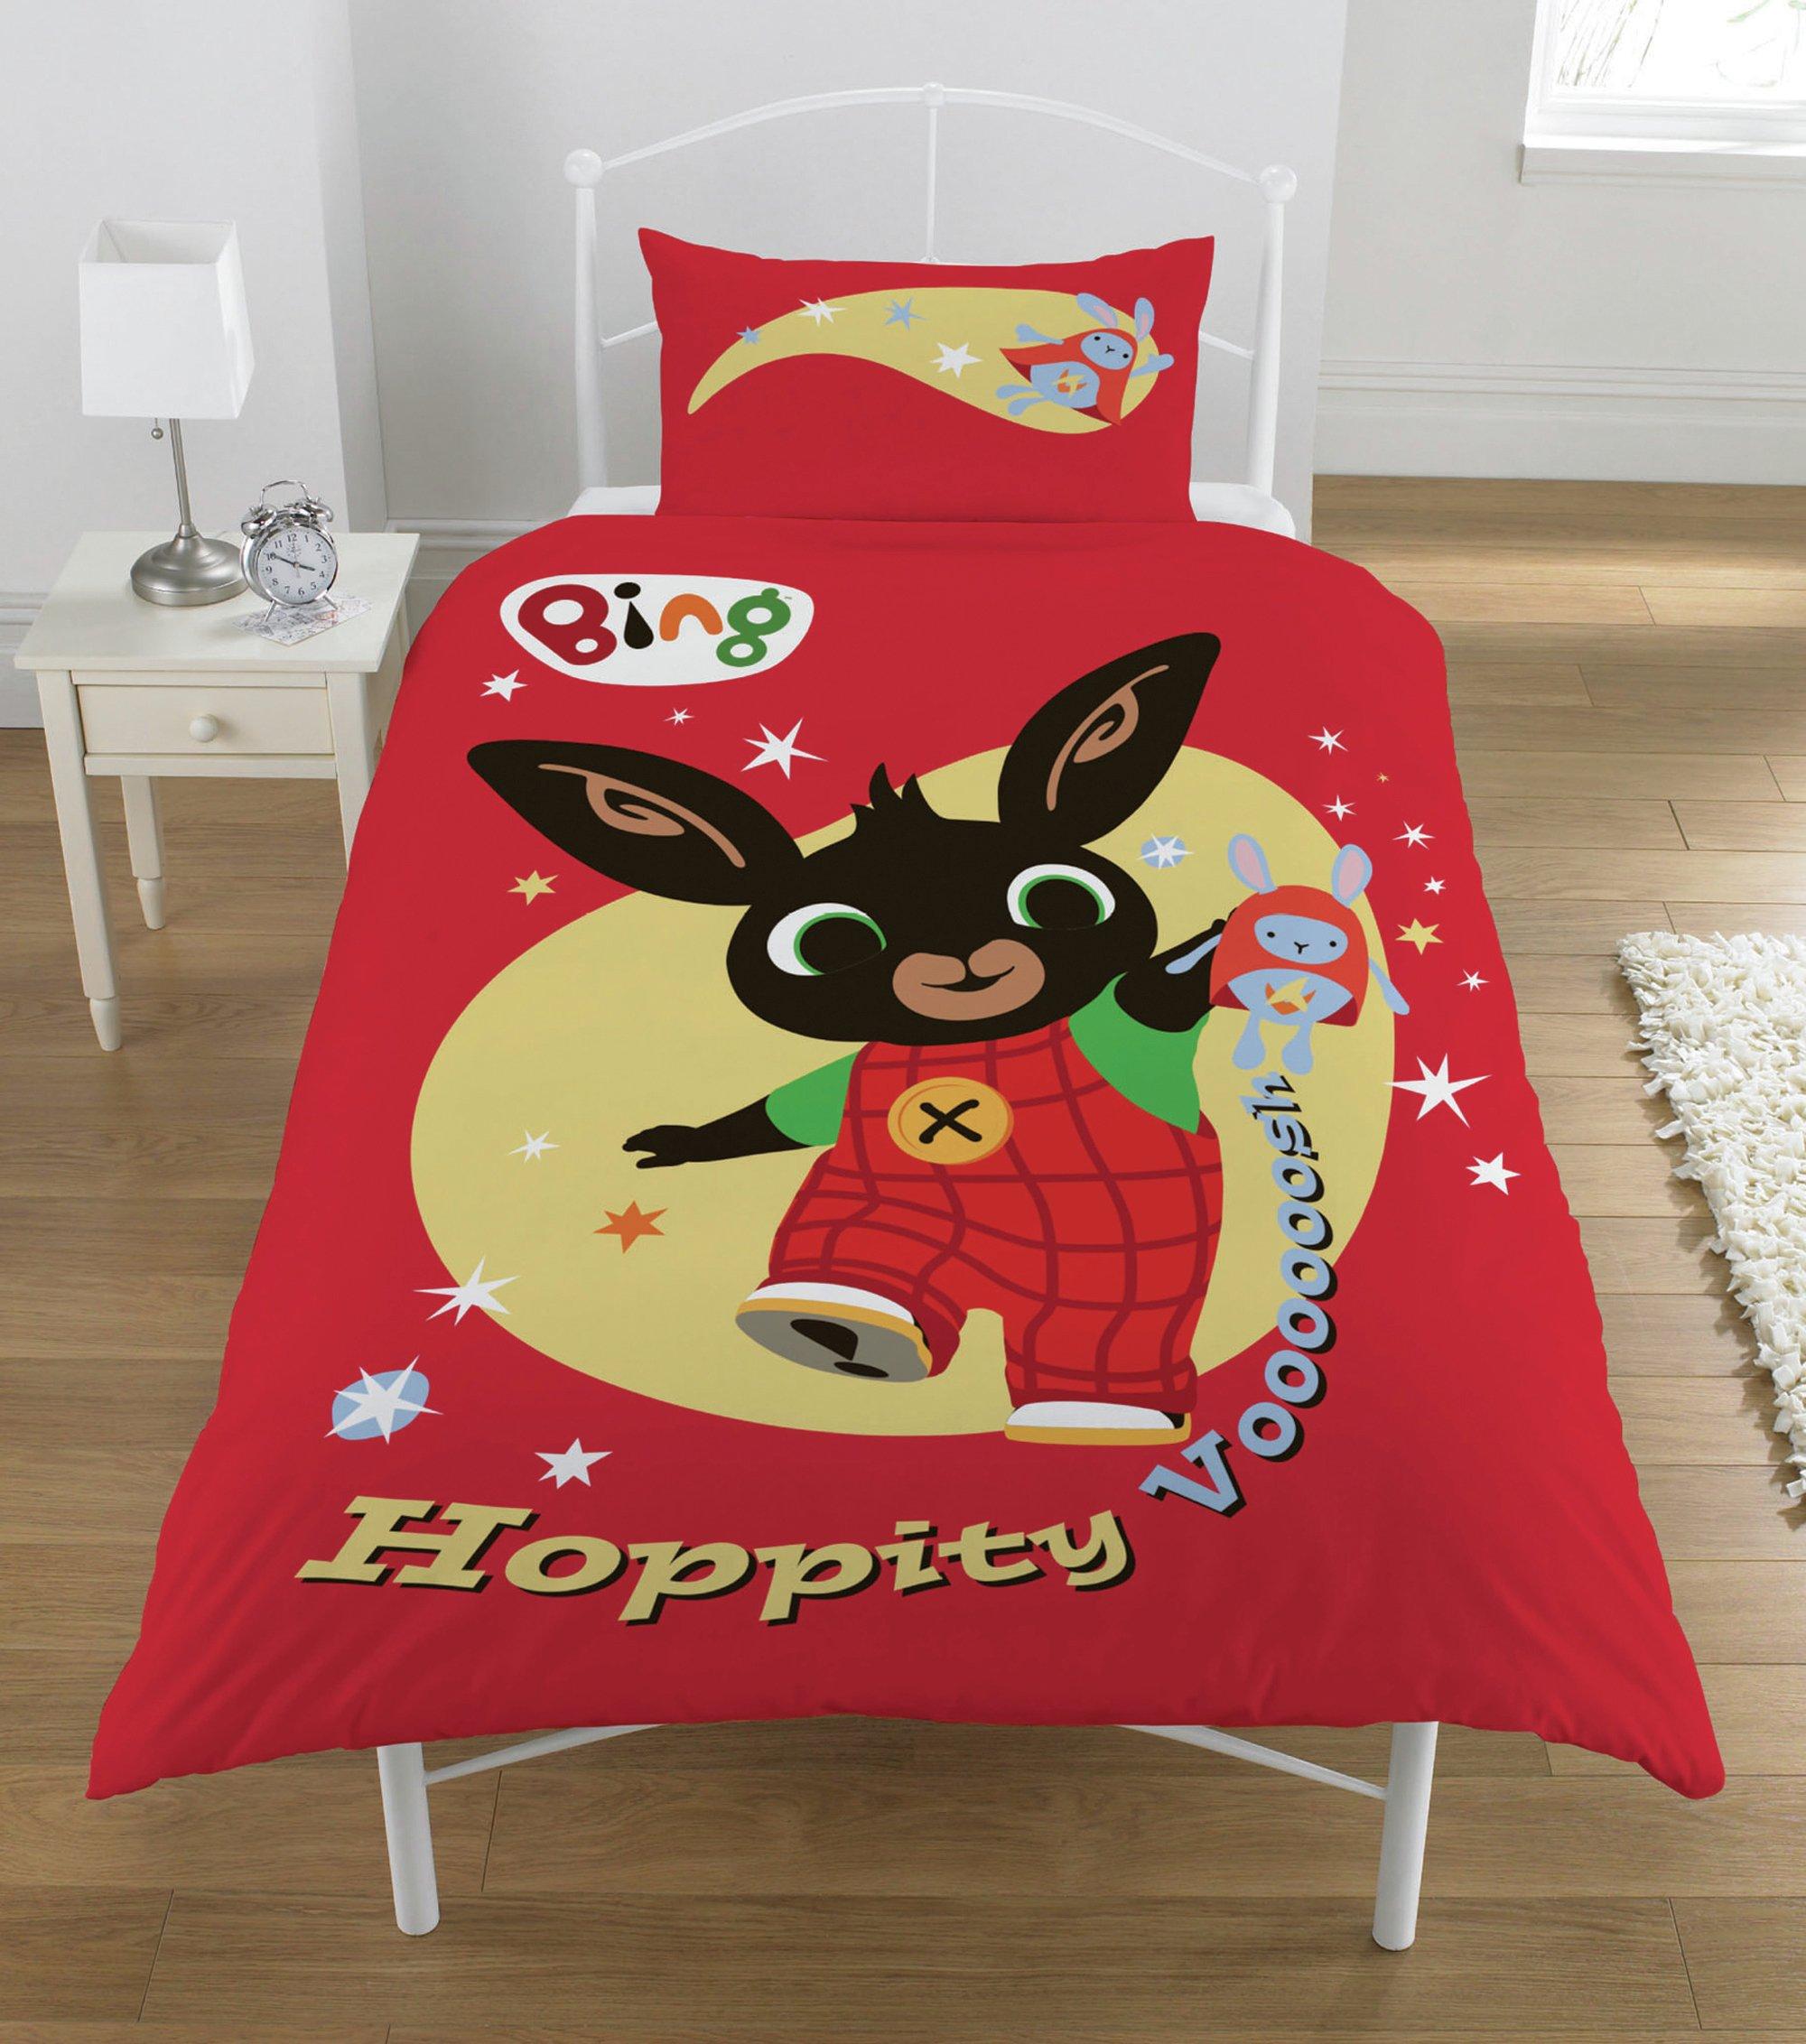 Bing Bunny Bedding Set Single